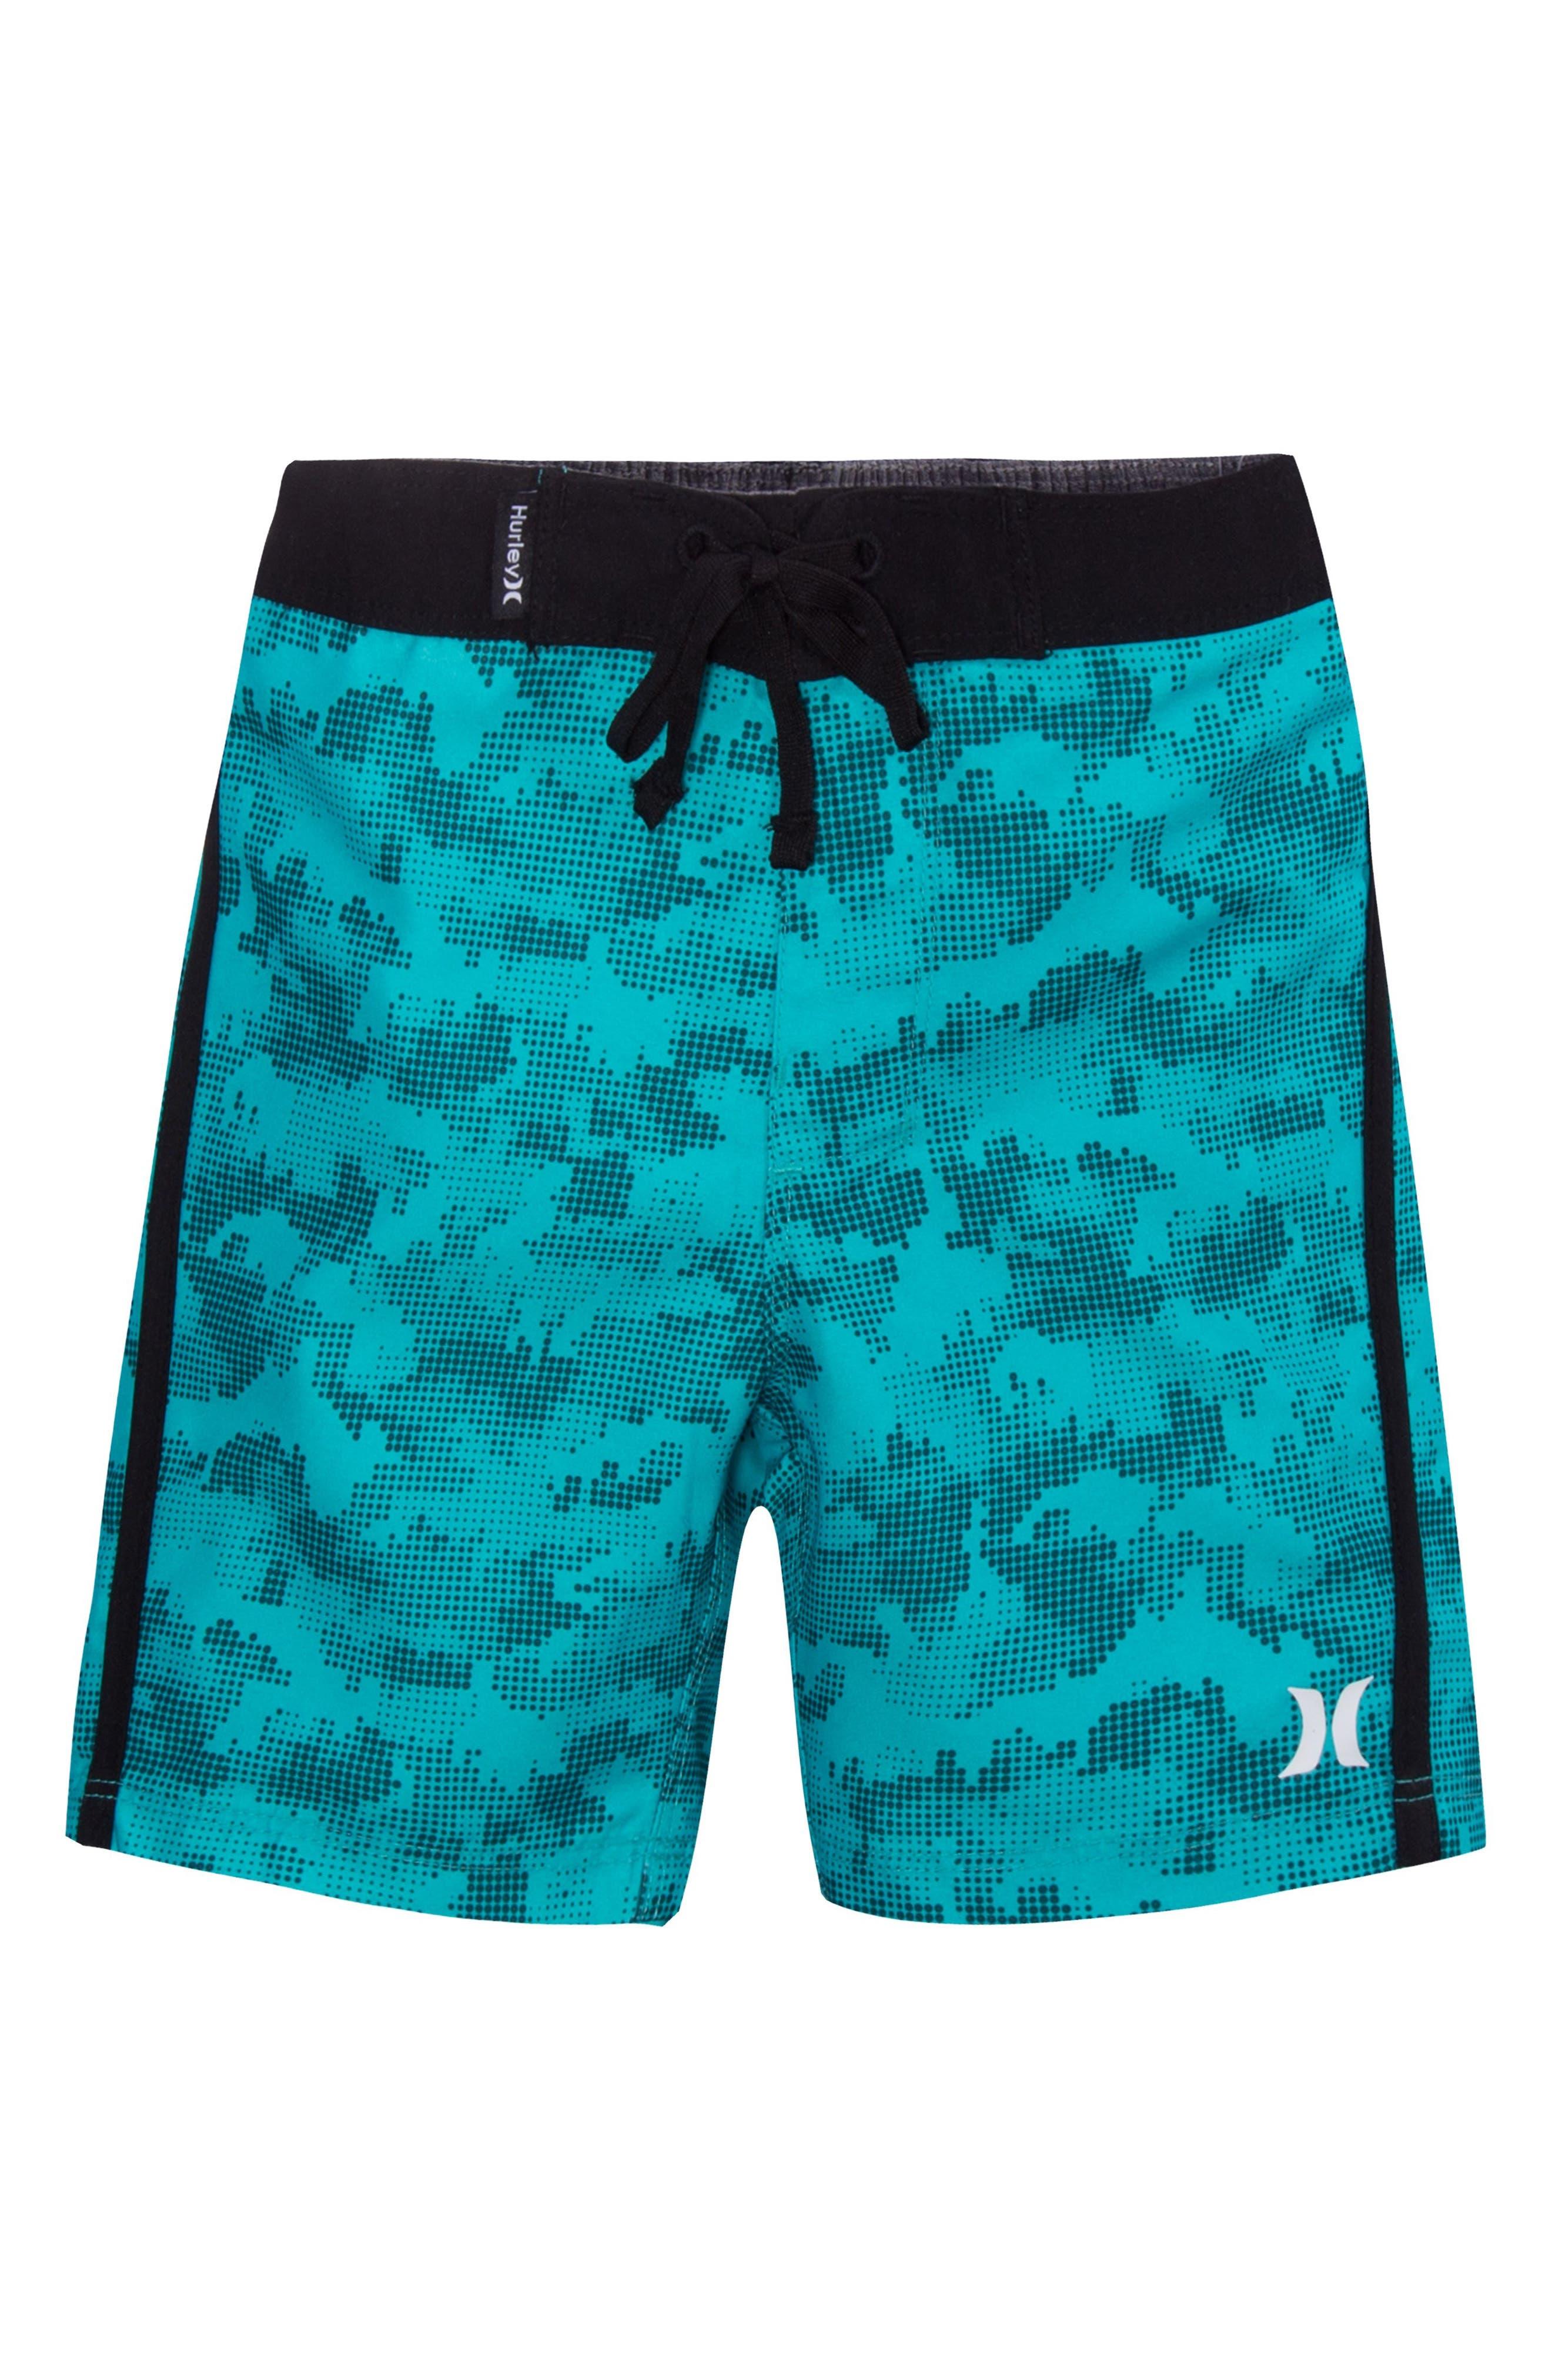 Main Image - Hurley Micro Camo Board Shorts (Big Boys)